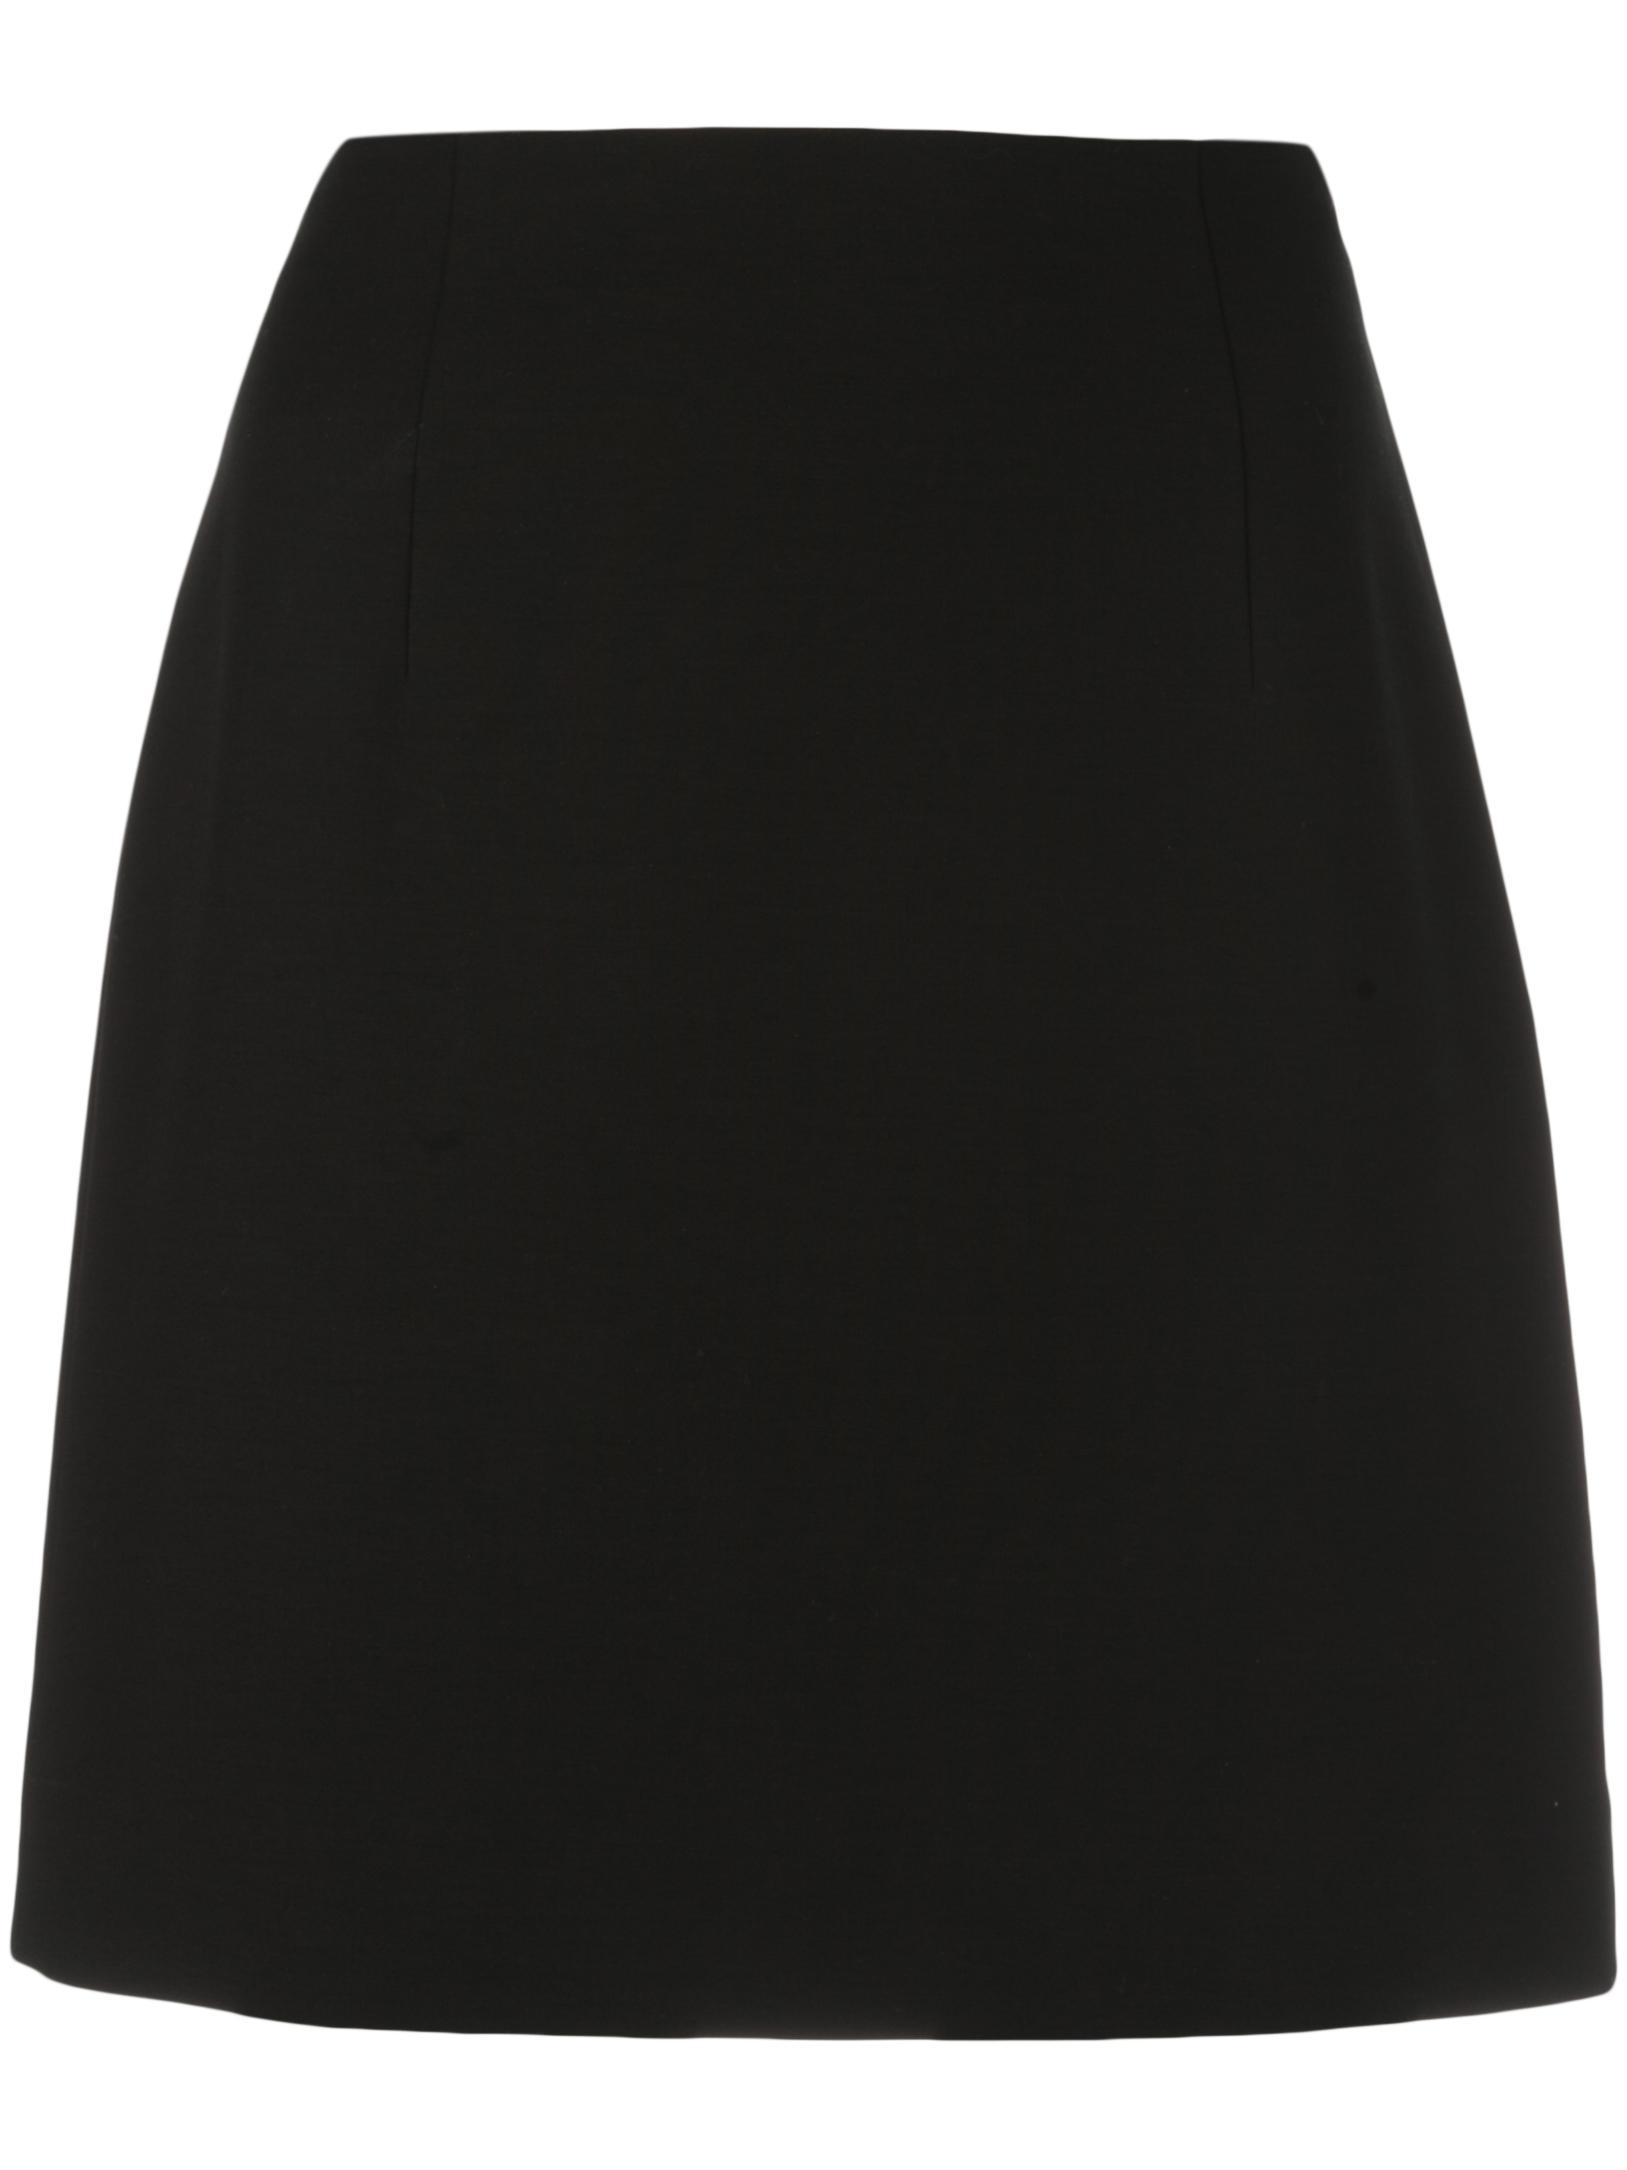 High Waist Mini Skirt Item # J0104303